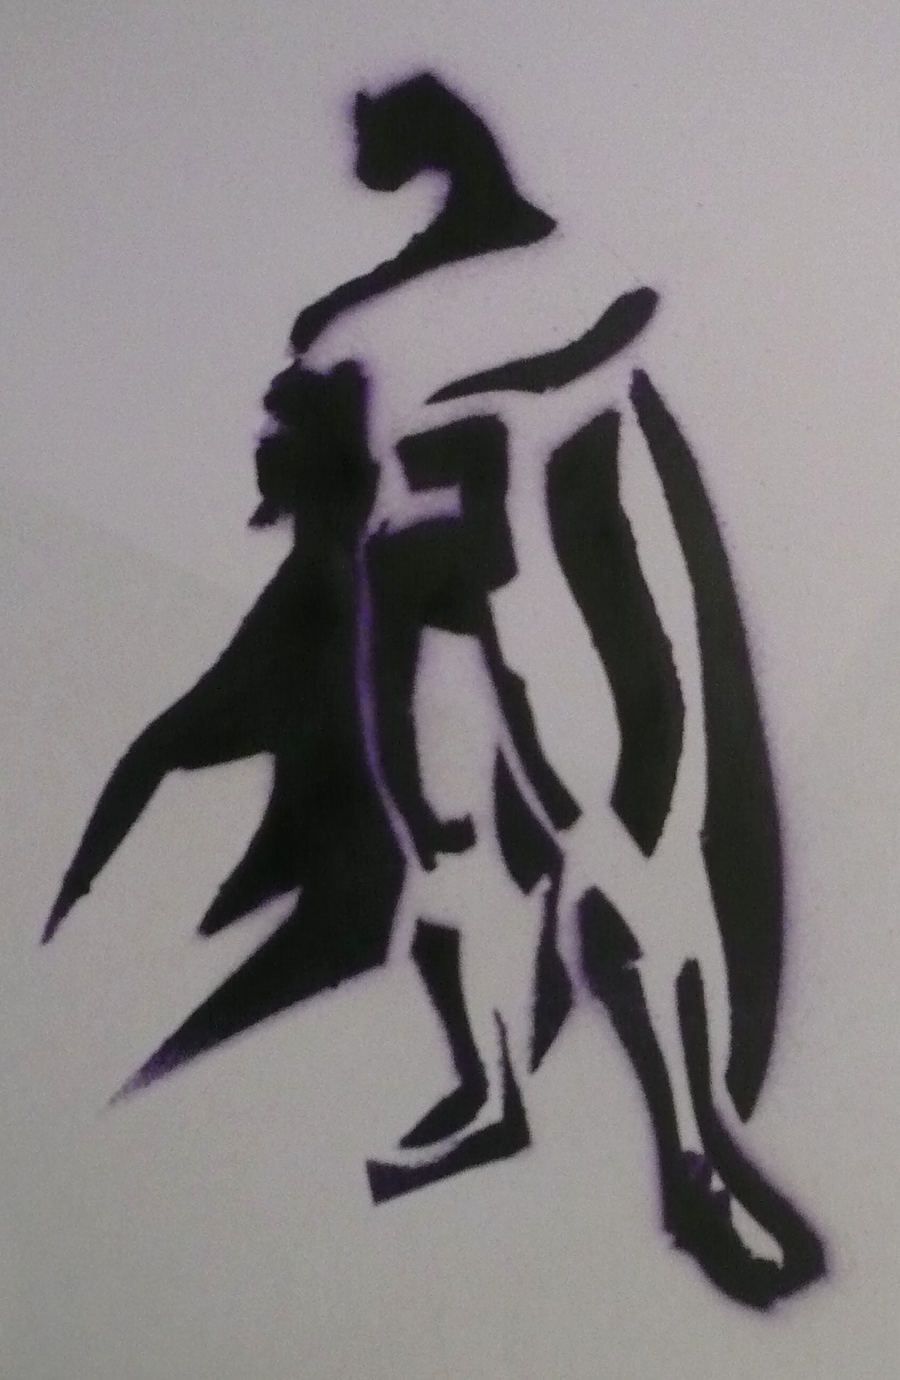 Batman Stencil Art New Batman Stencil by Jamahata On Deviantart